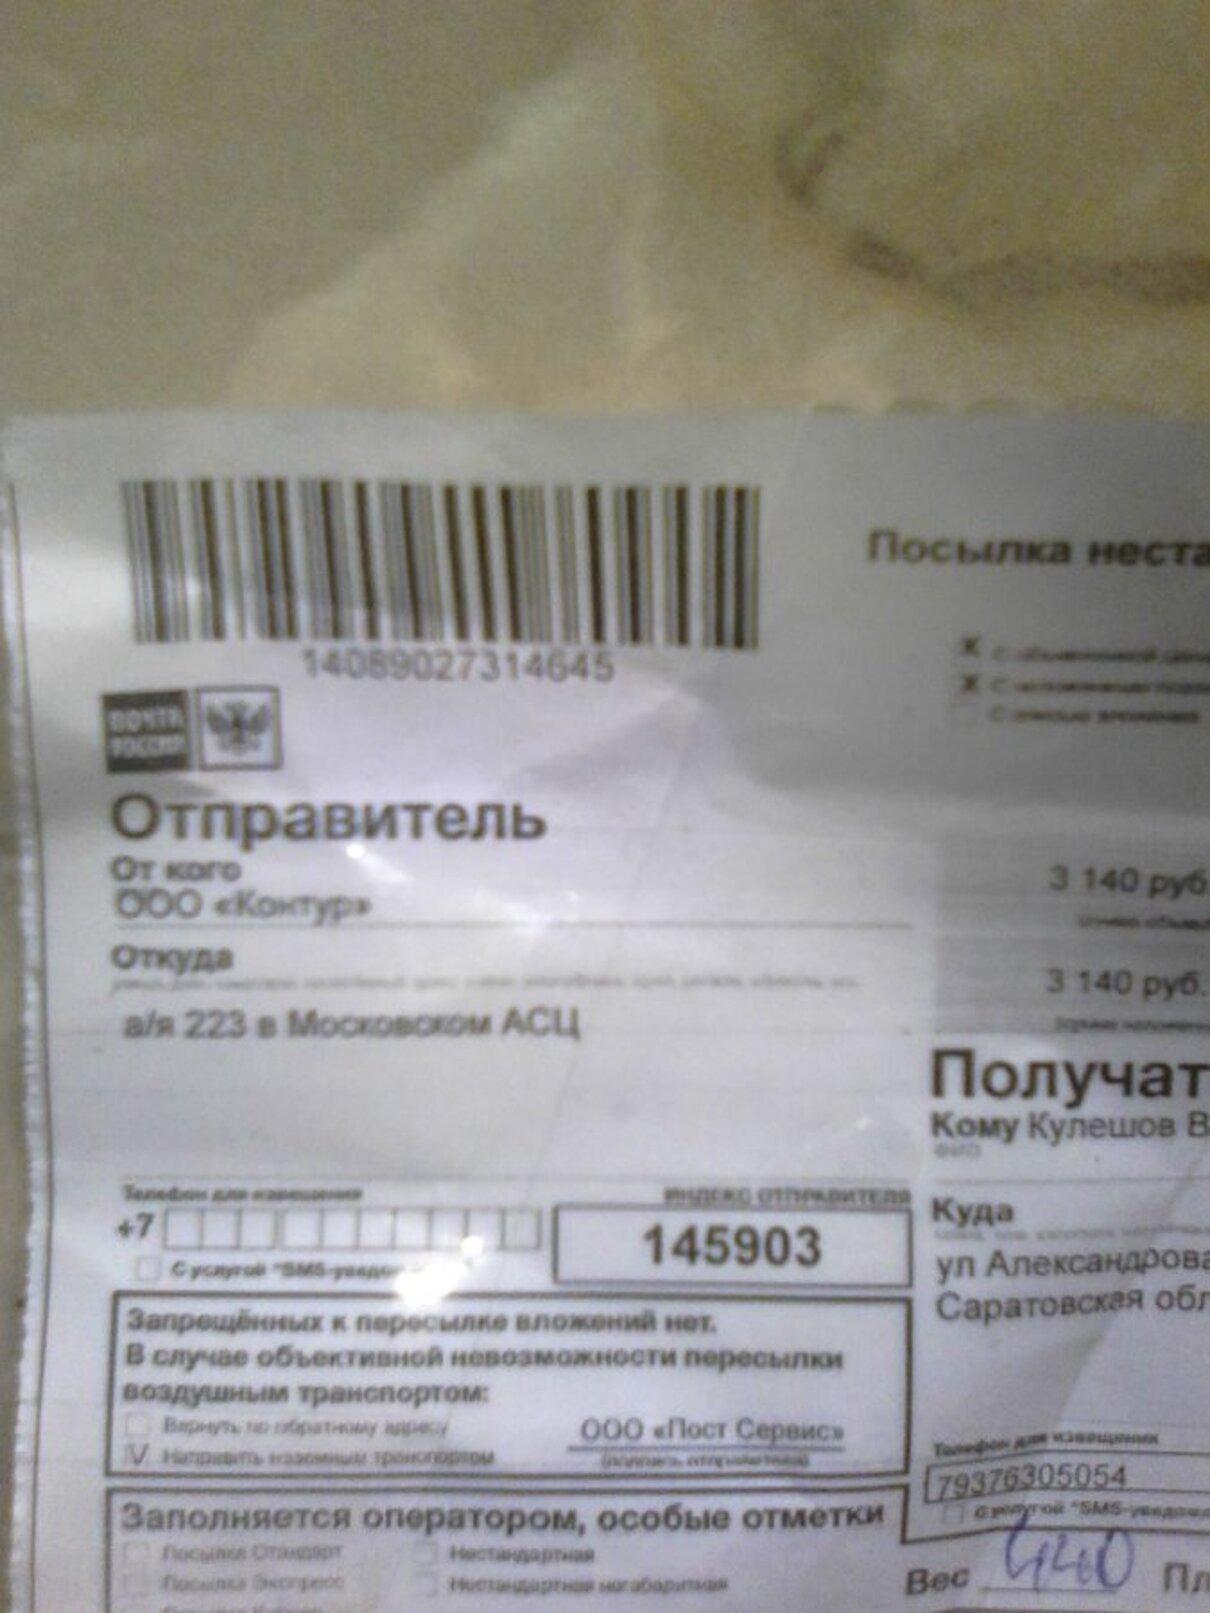 Жалоба-отзыв: Интернэт-магазин - Обман.  Фото №5